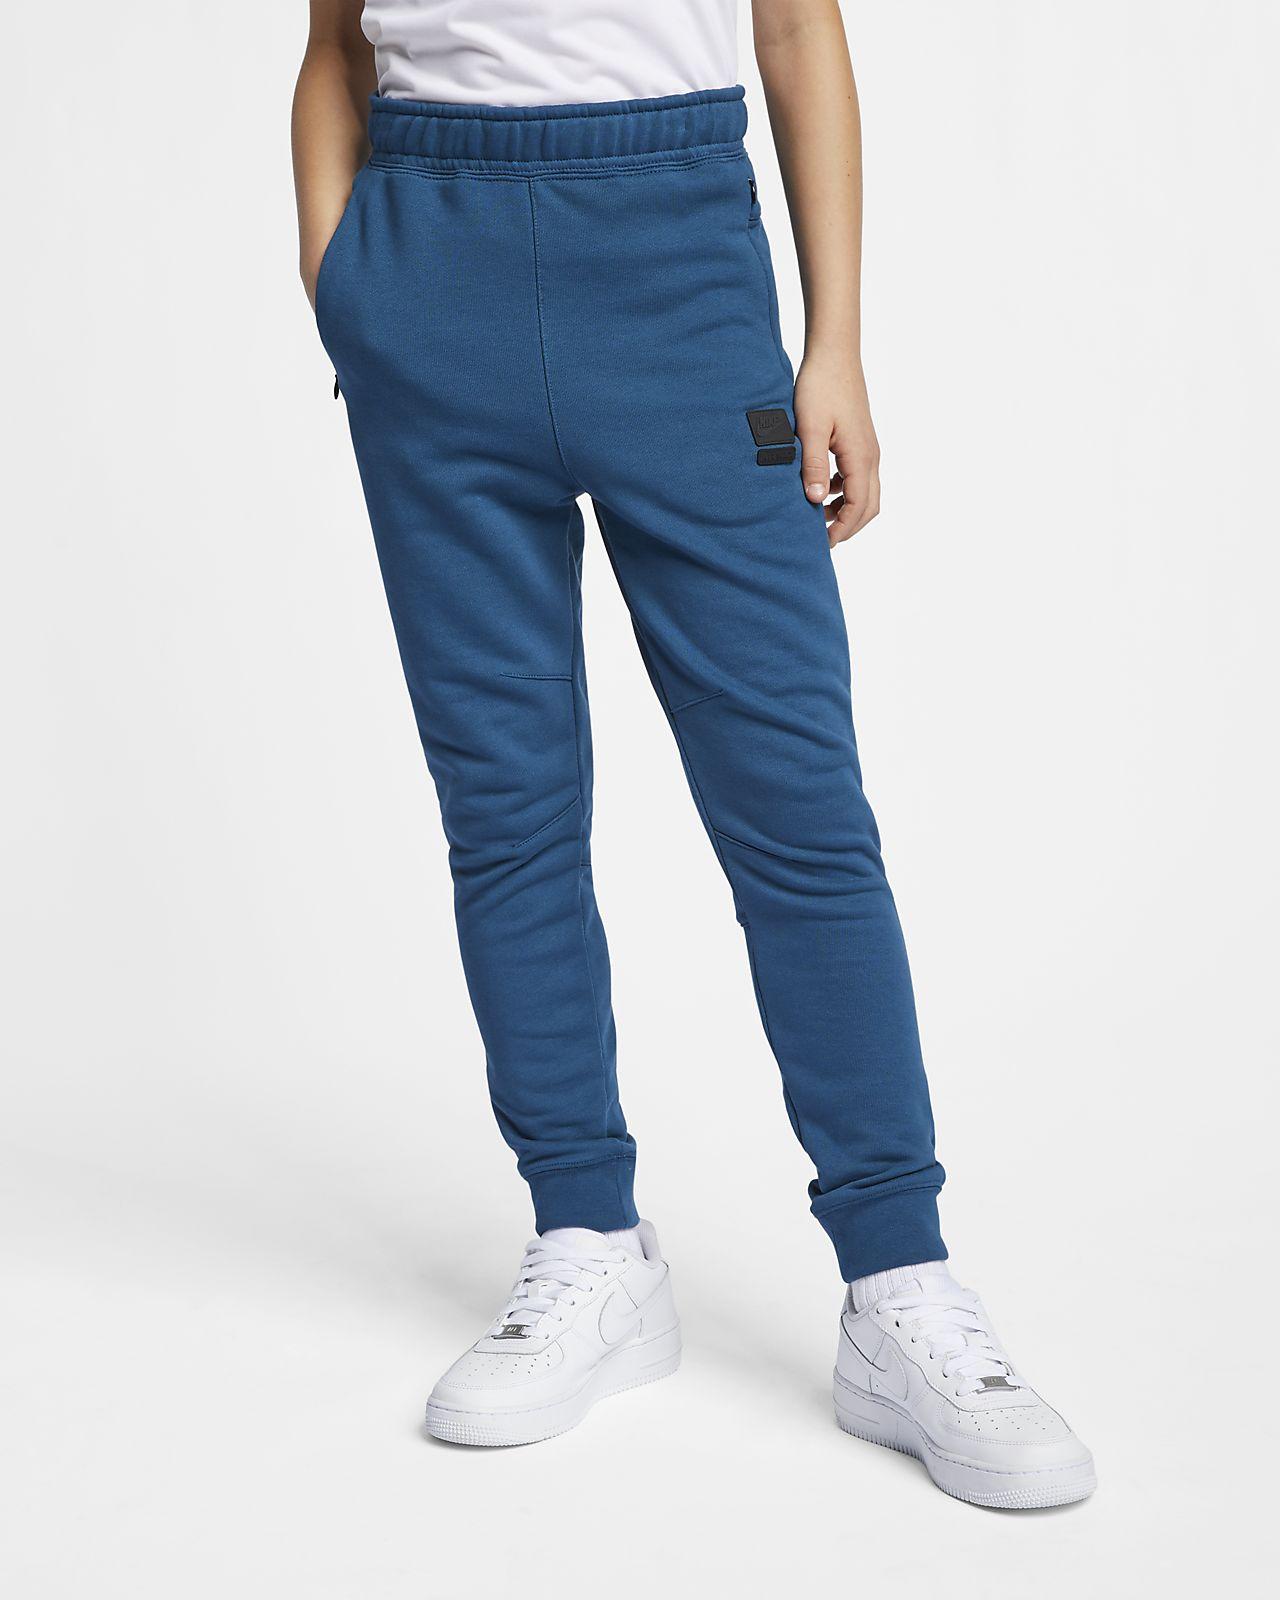 Pantaloni Nike Sportswear - Ragazzo